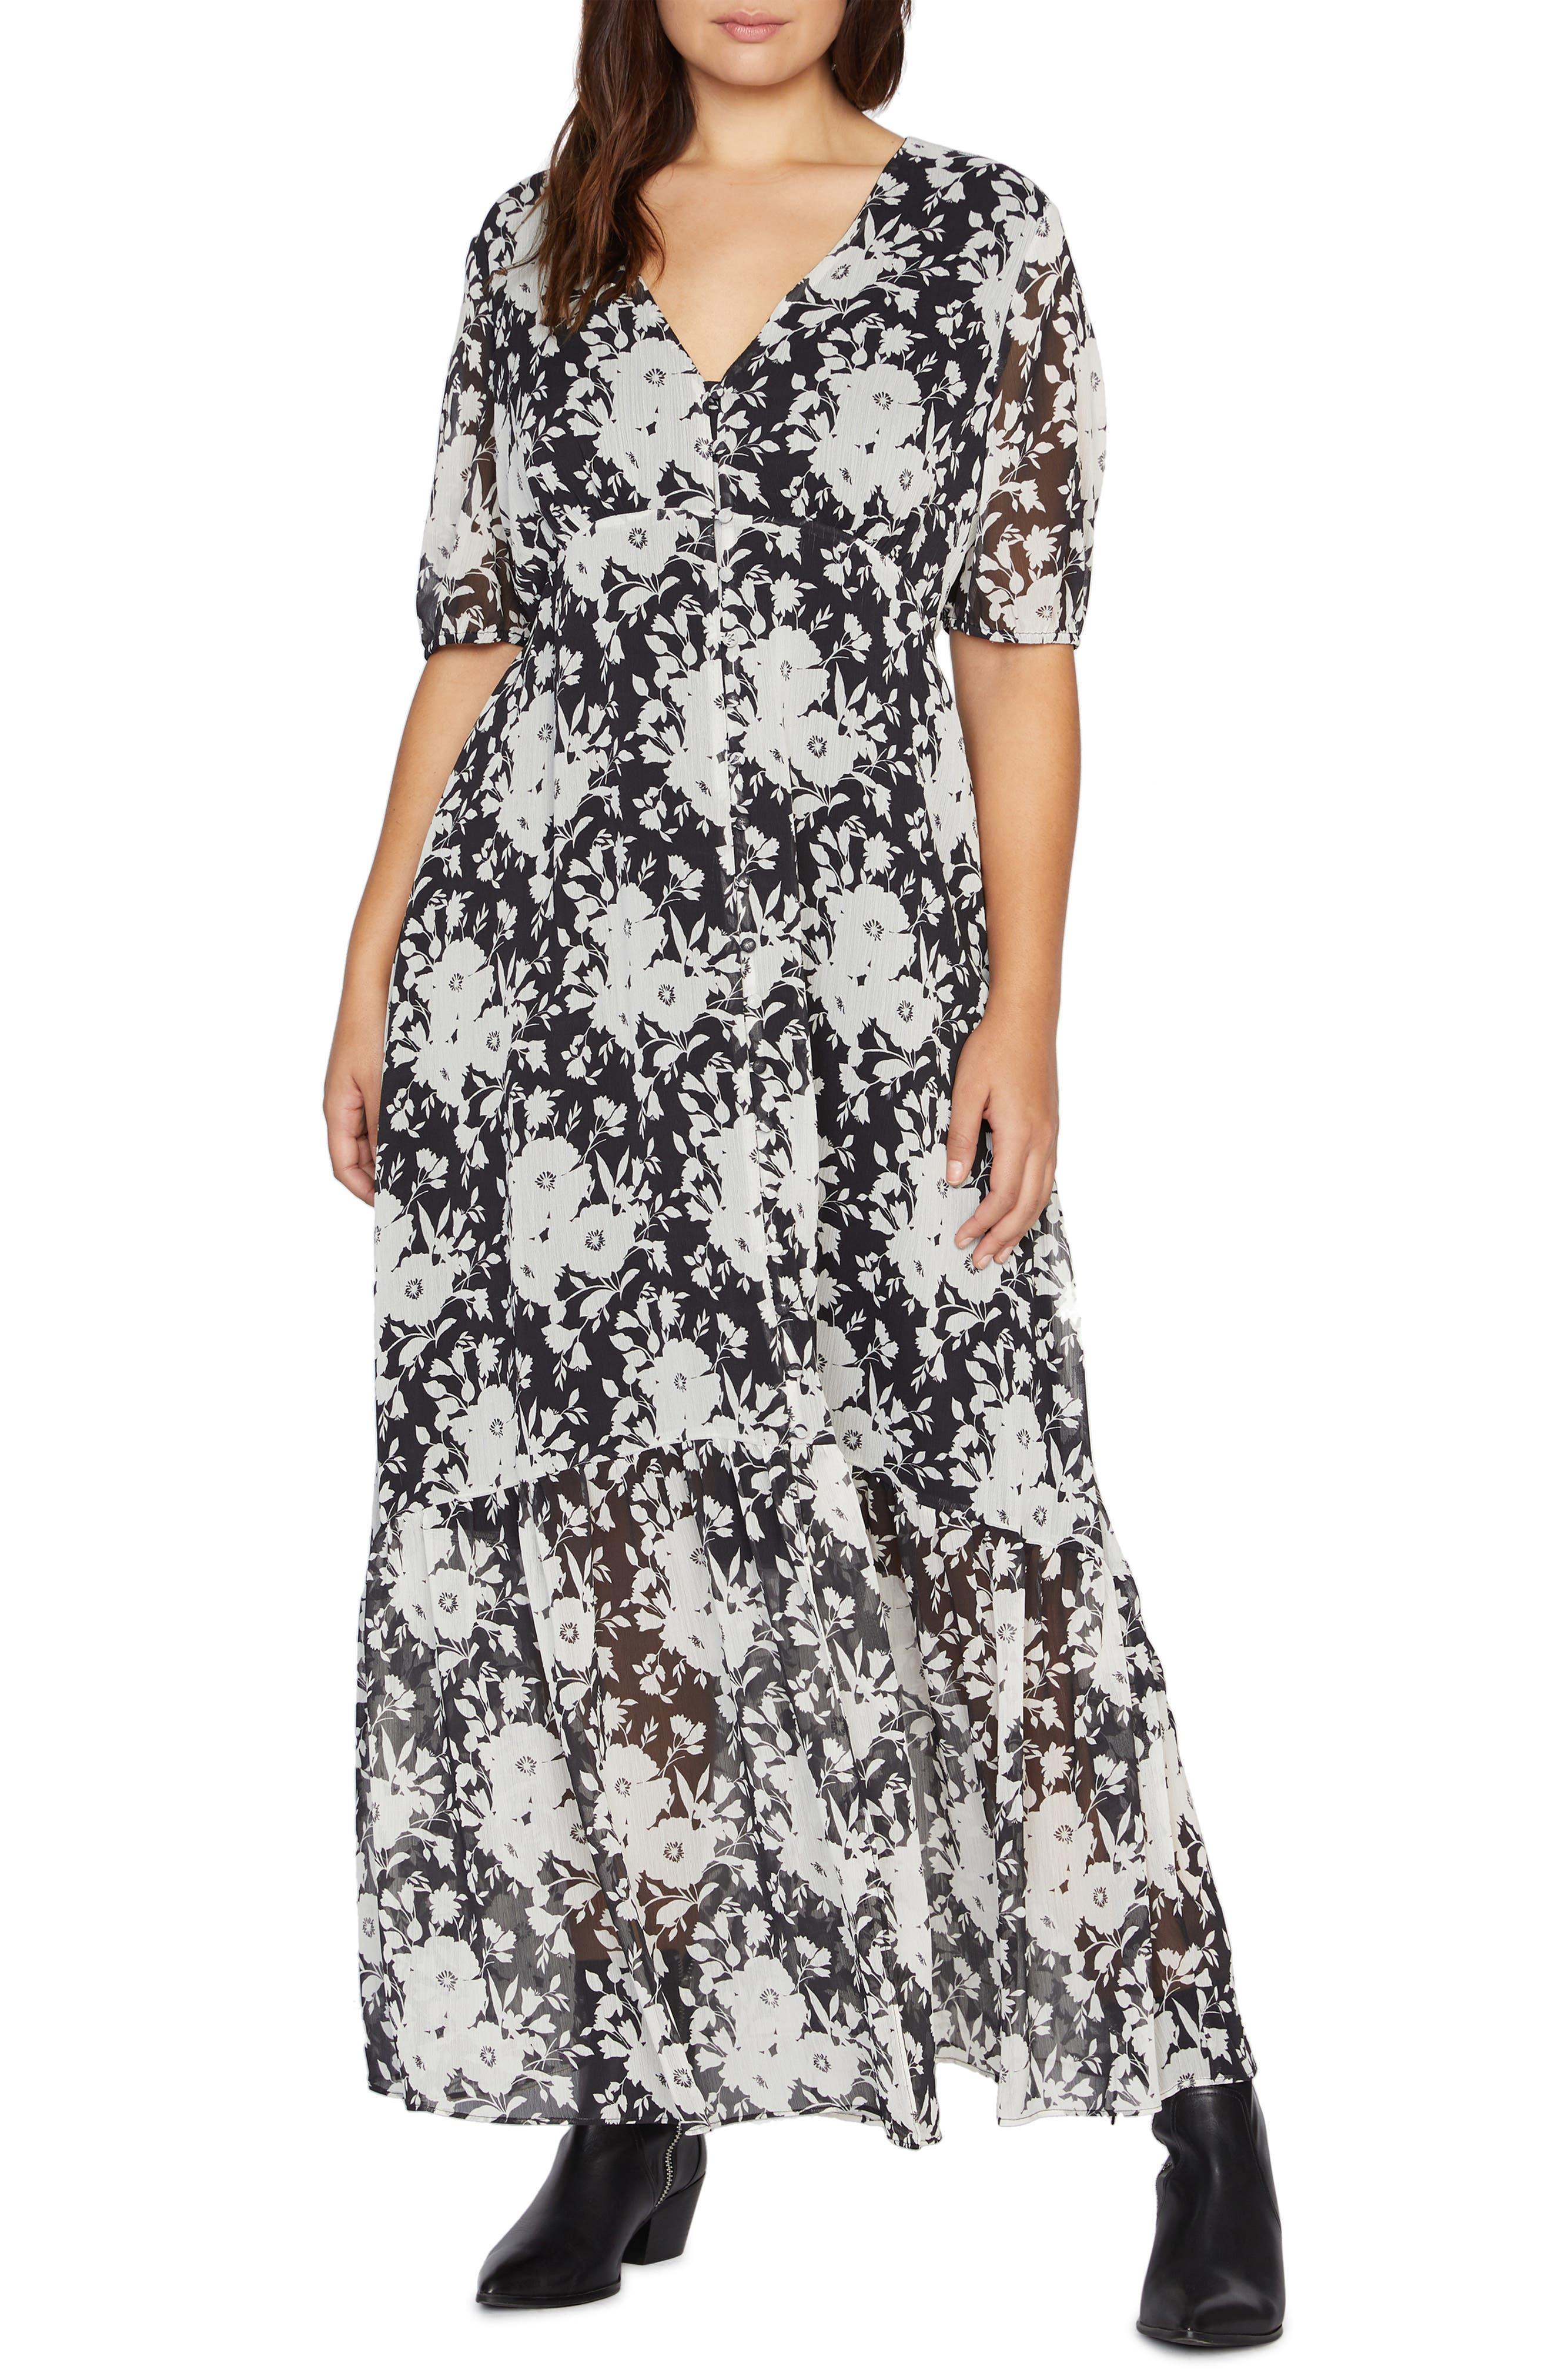 Florence Floral Dress